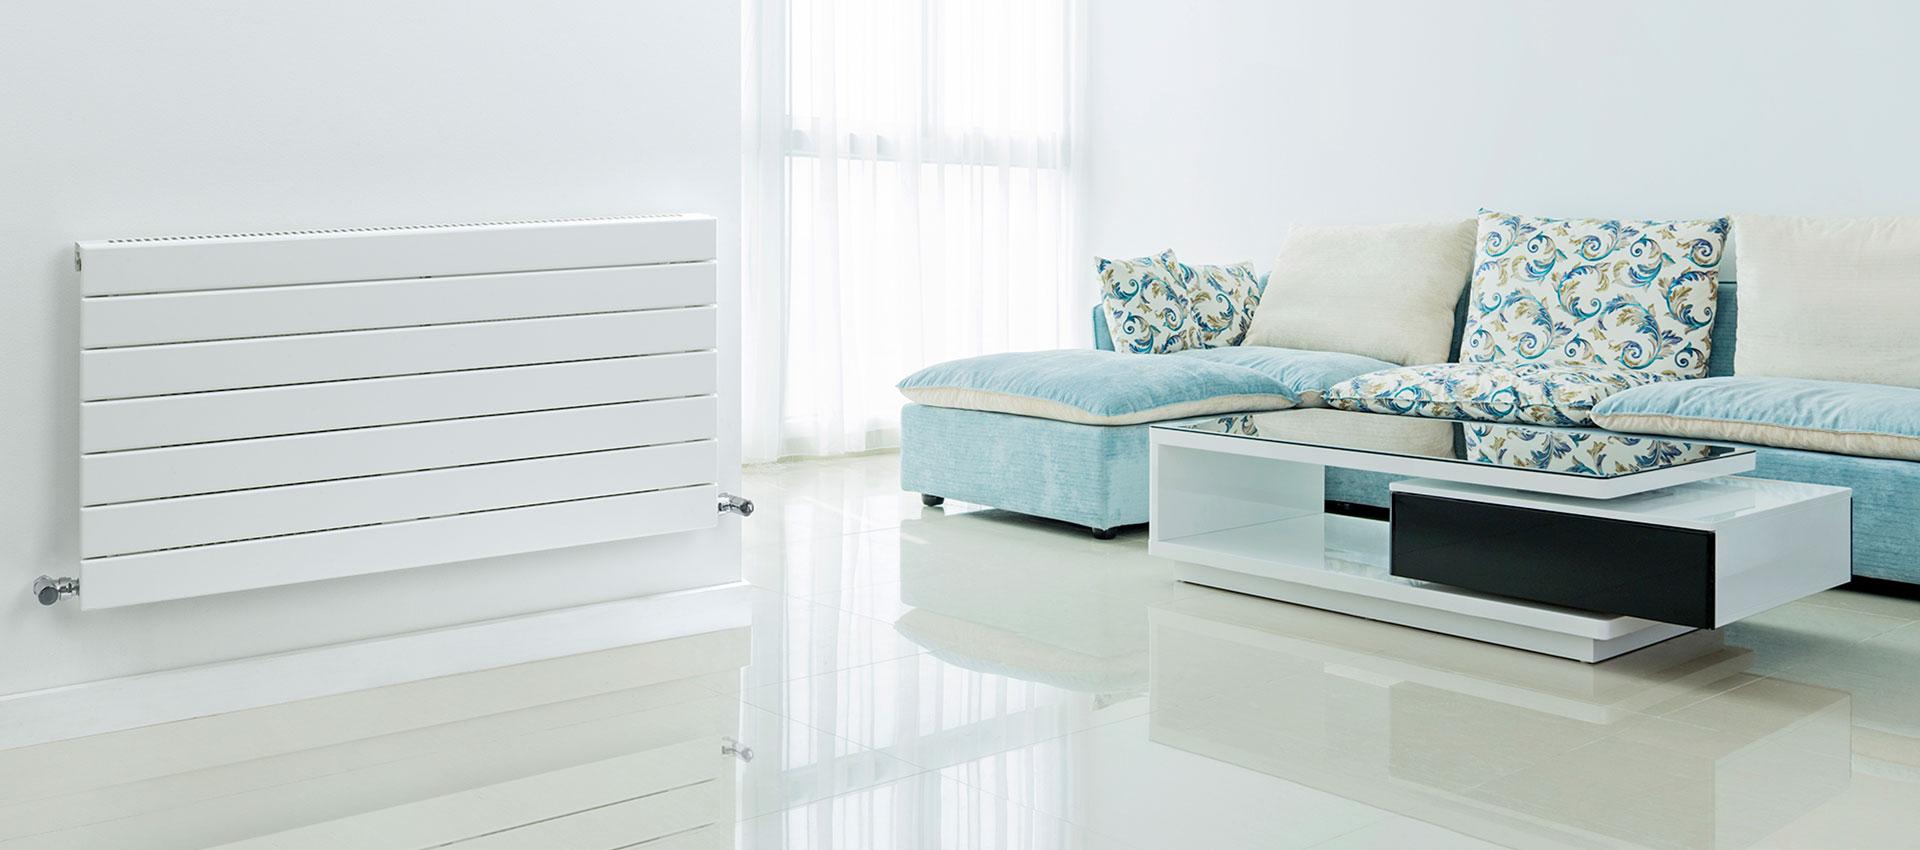 Designer Radiators For Living Rooms